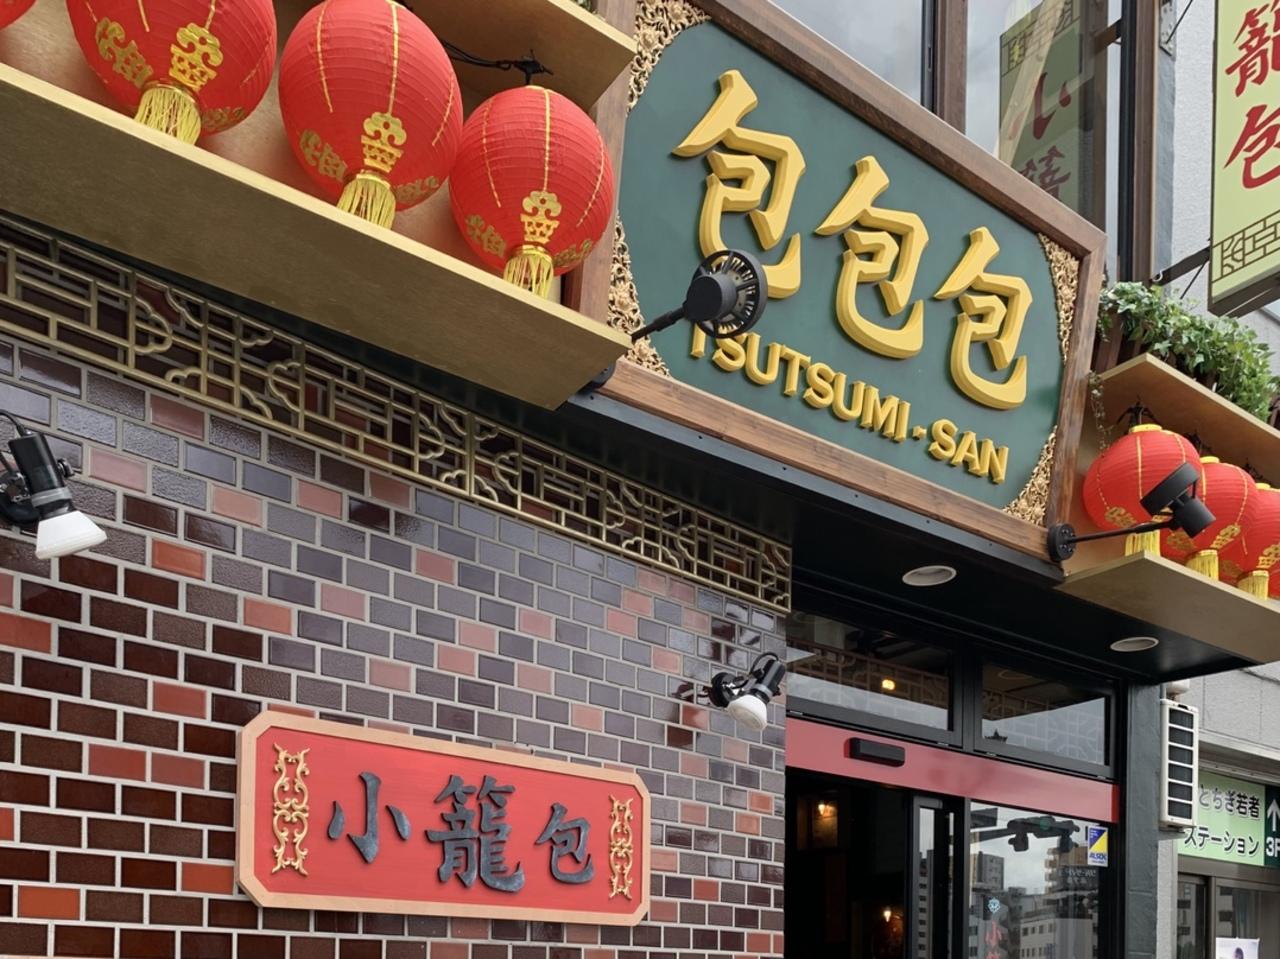 JR宇都宮西口に小籠包専門店「包包包」(つつむが三つで つつみさん)がOPEN!